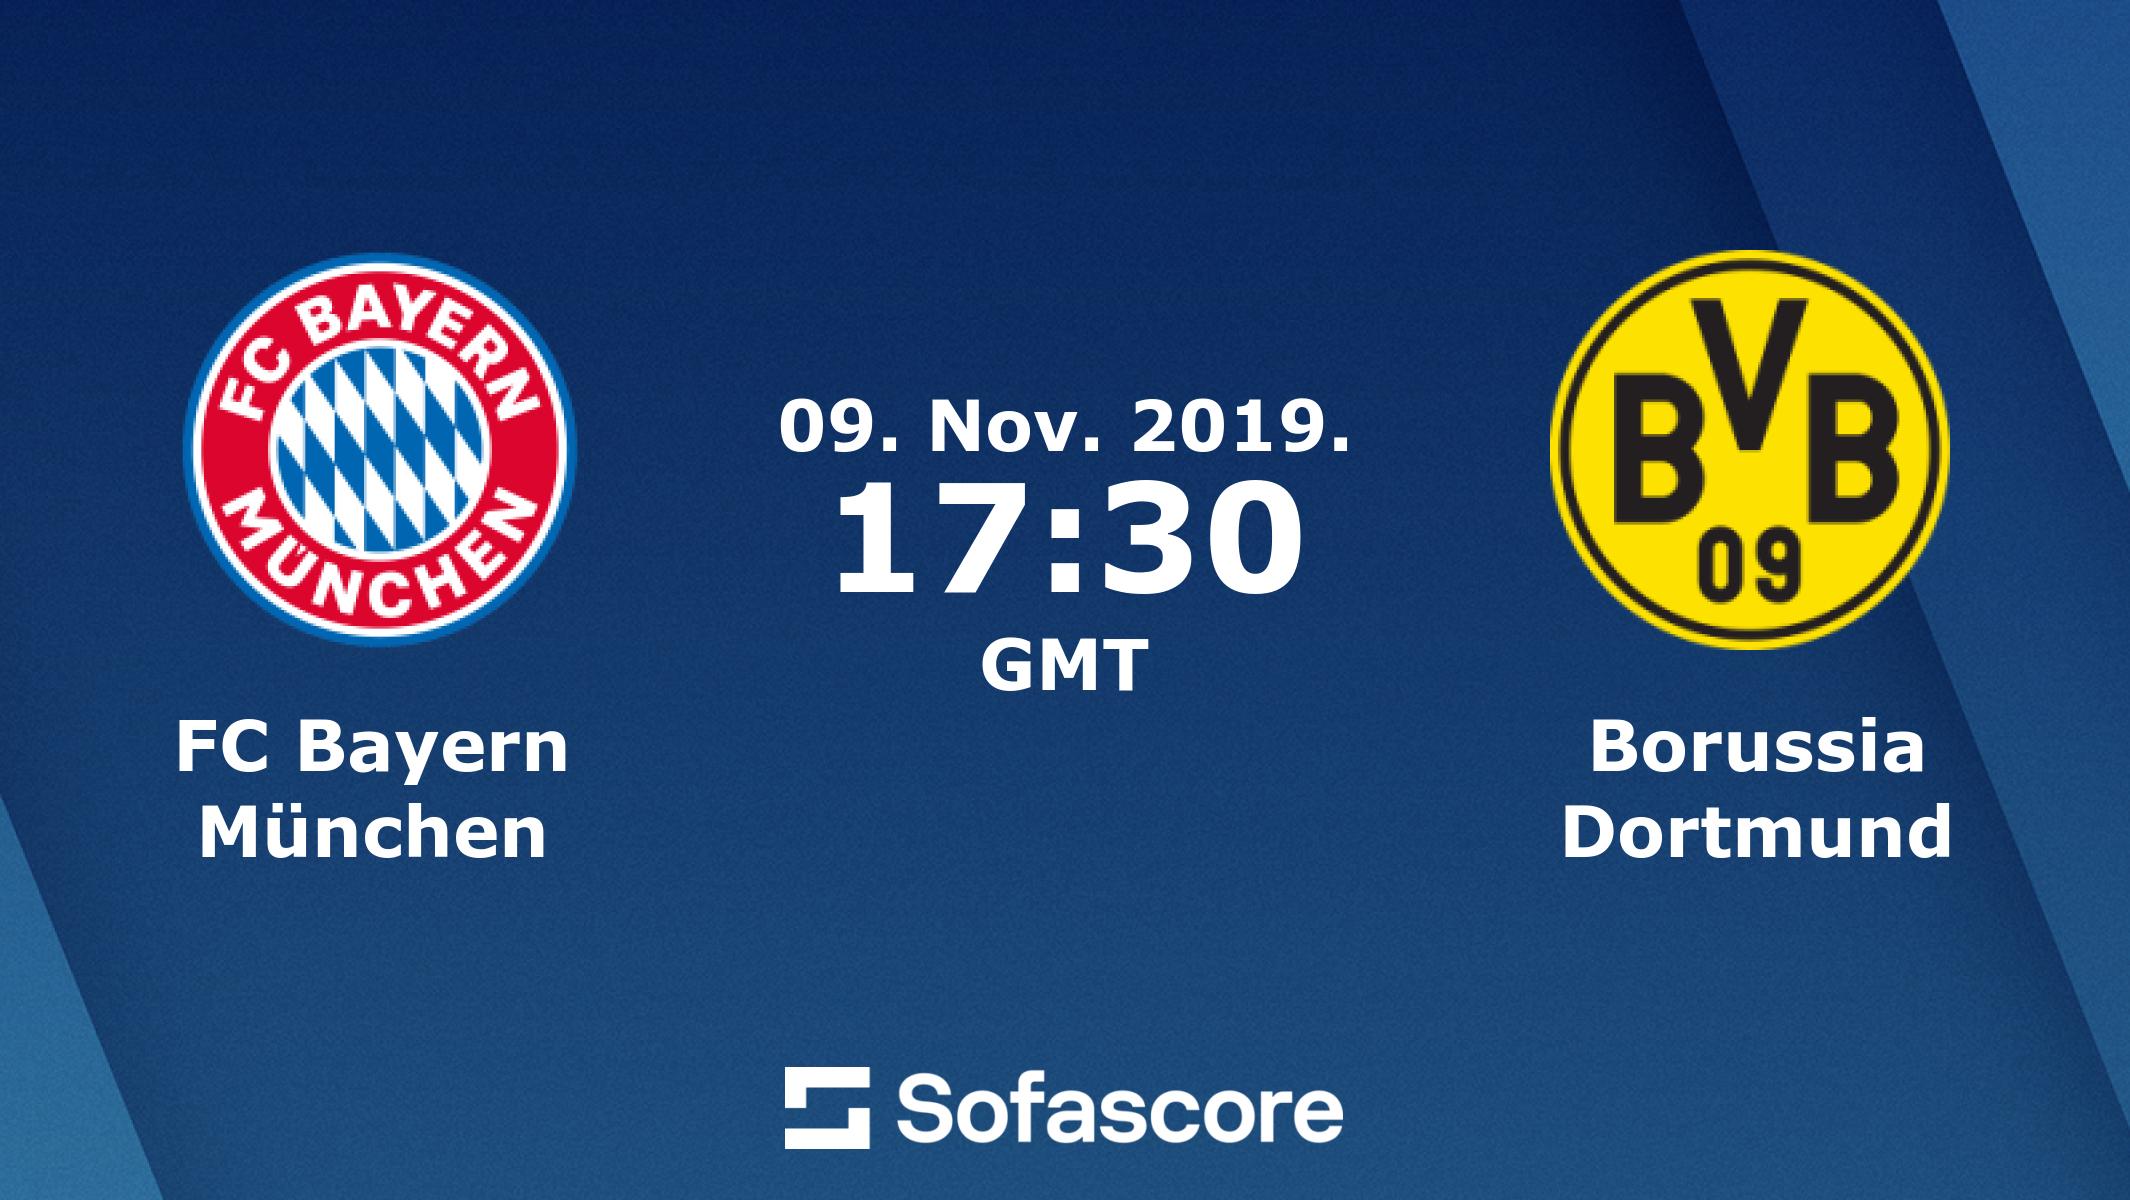 Bayern Munchen Borussia Dortmund Live Score Video Stream